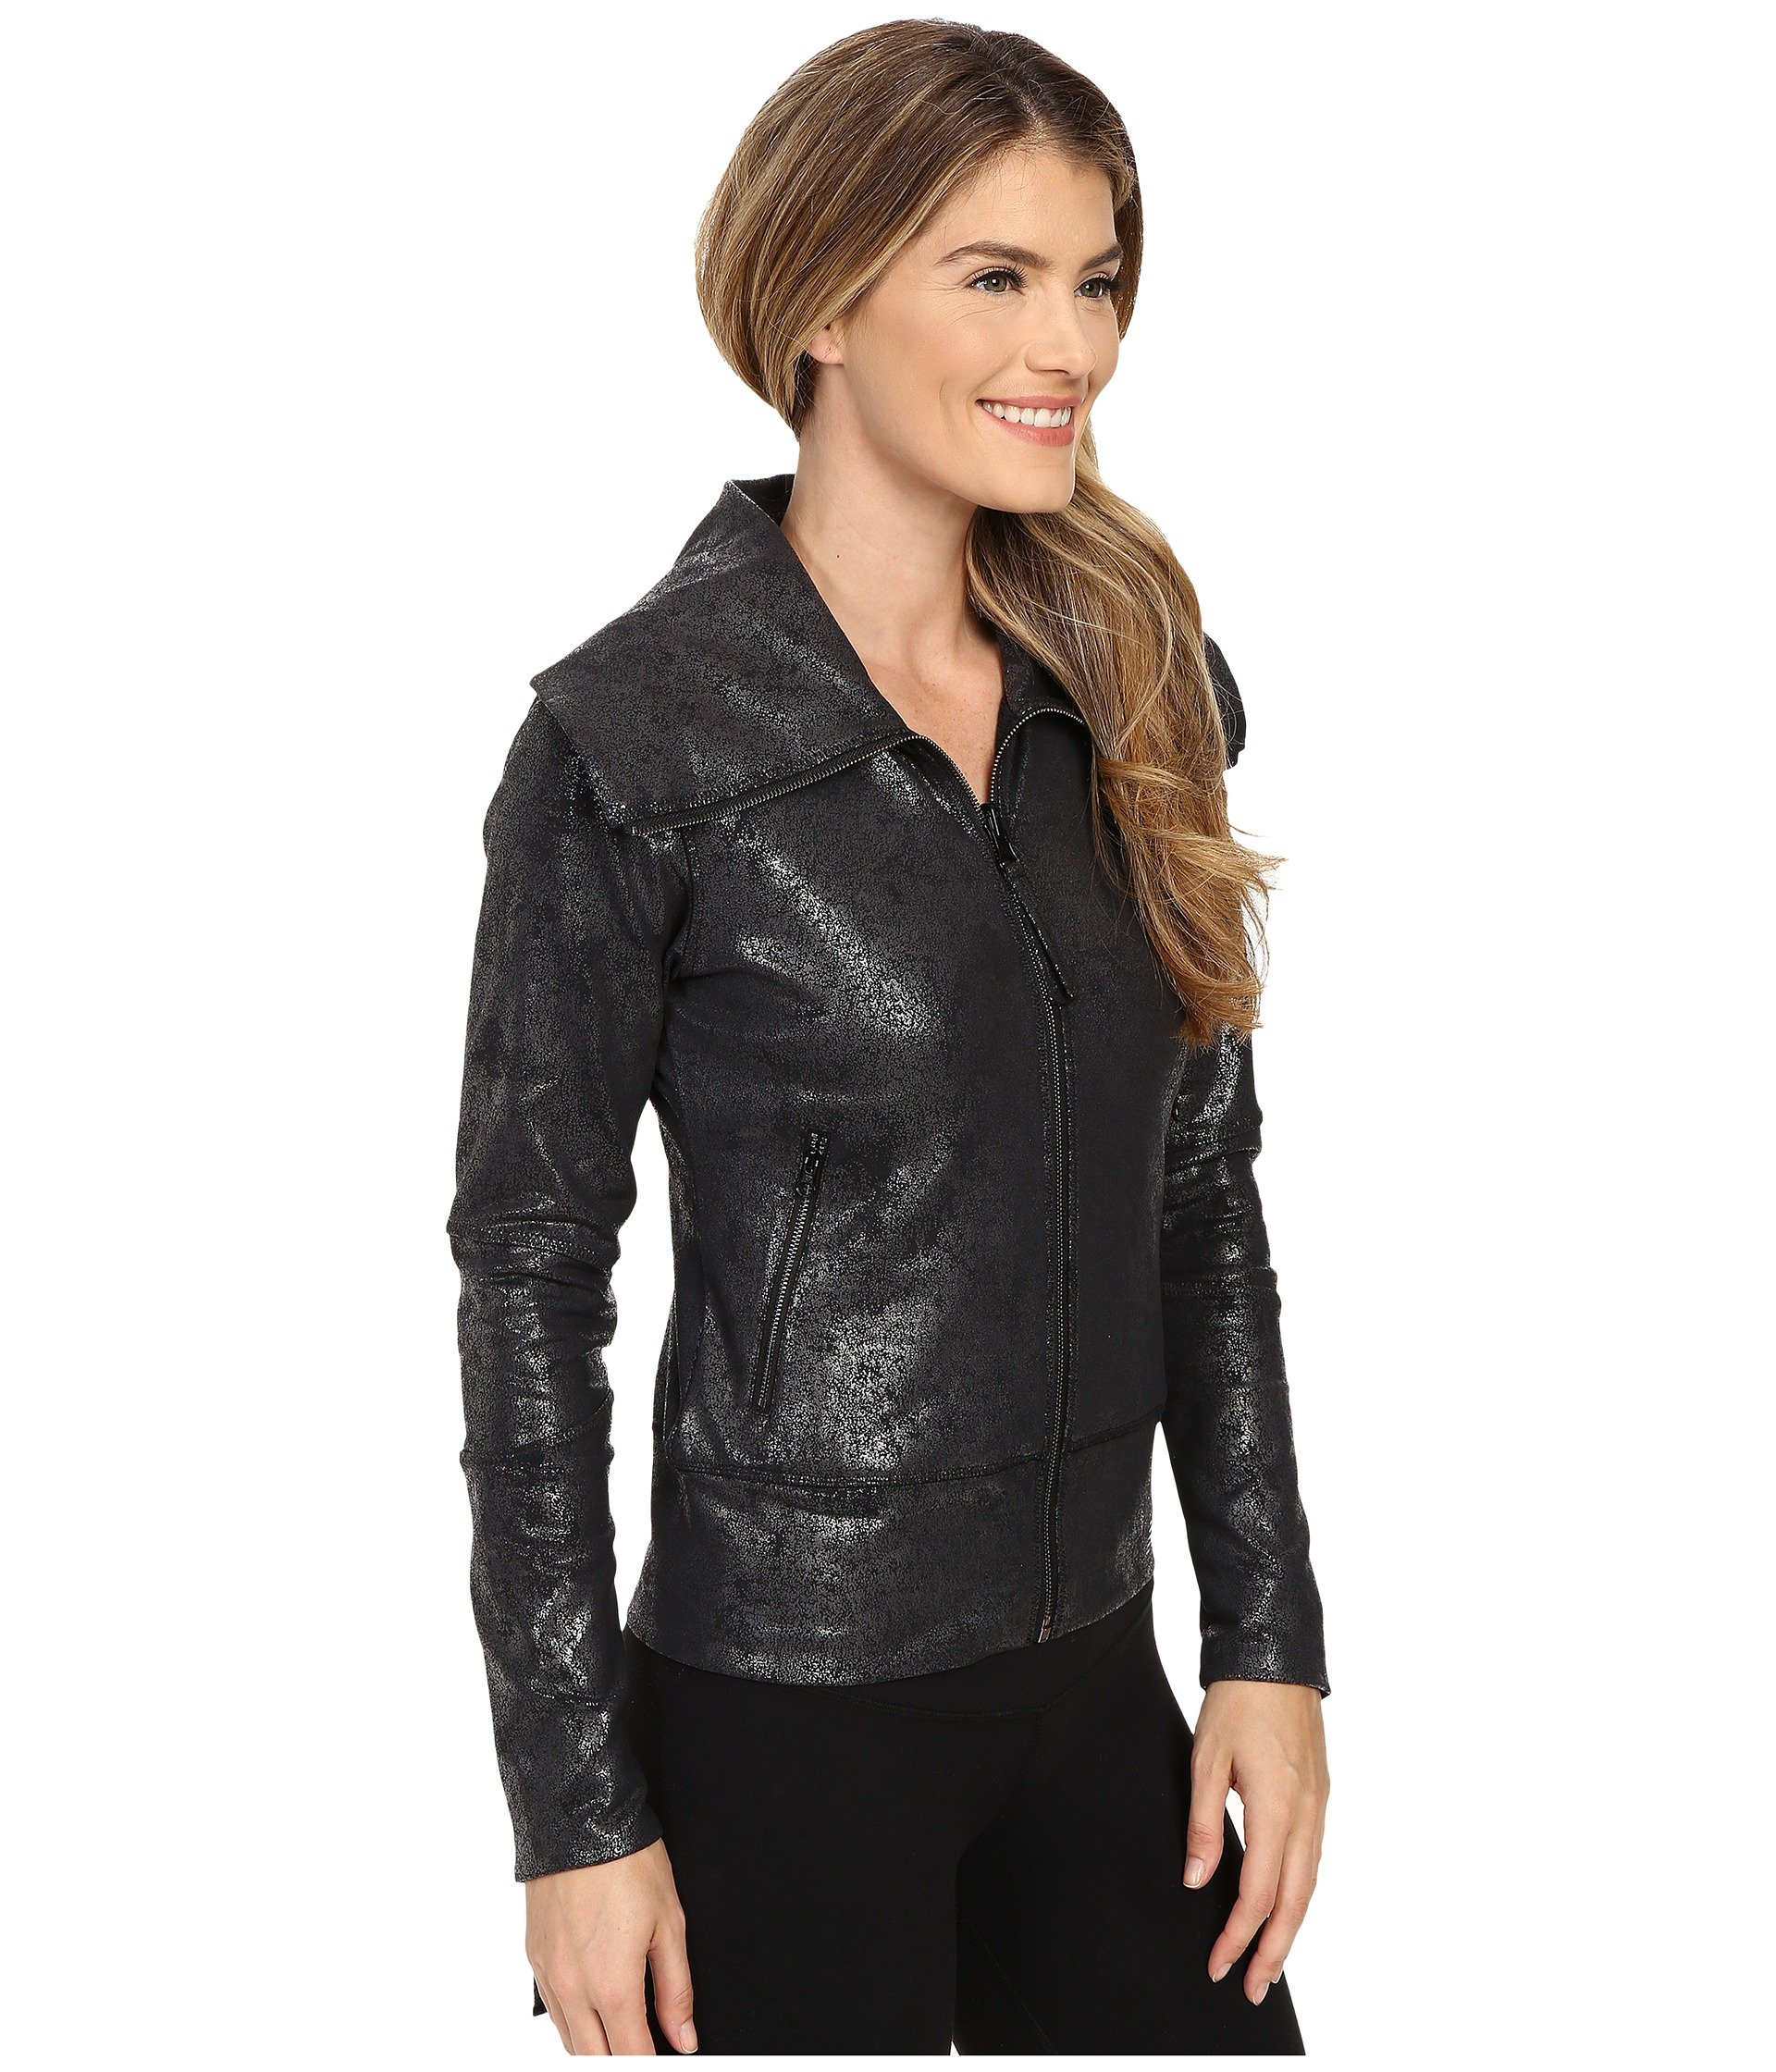 Women's New Balance Shadow Moto Jacket Black Multi